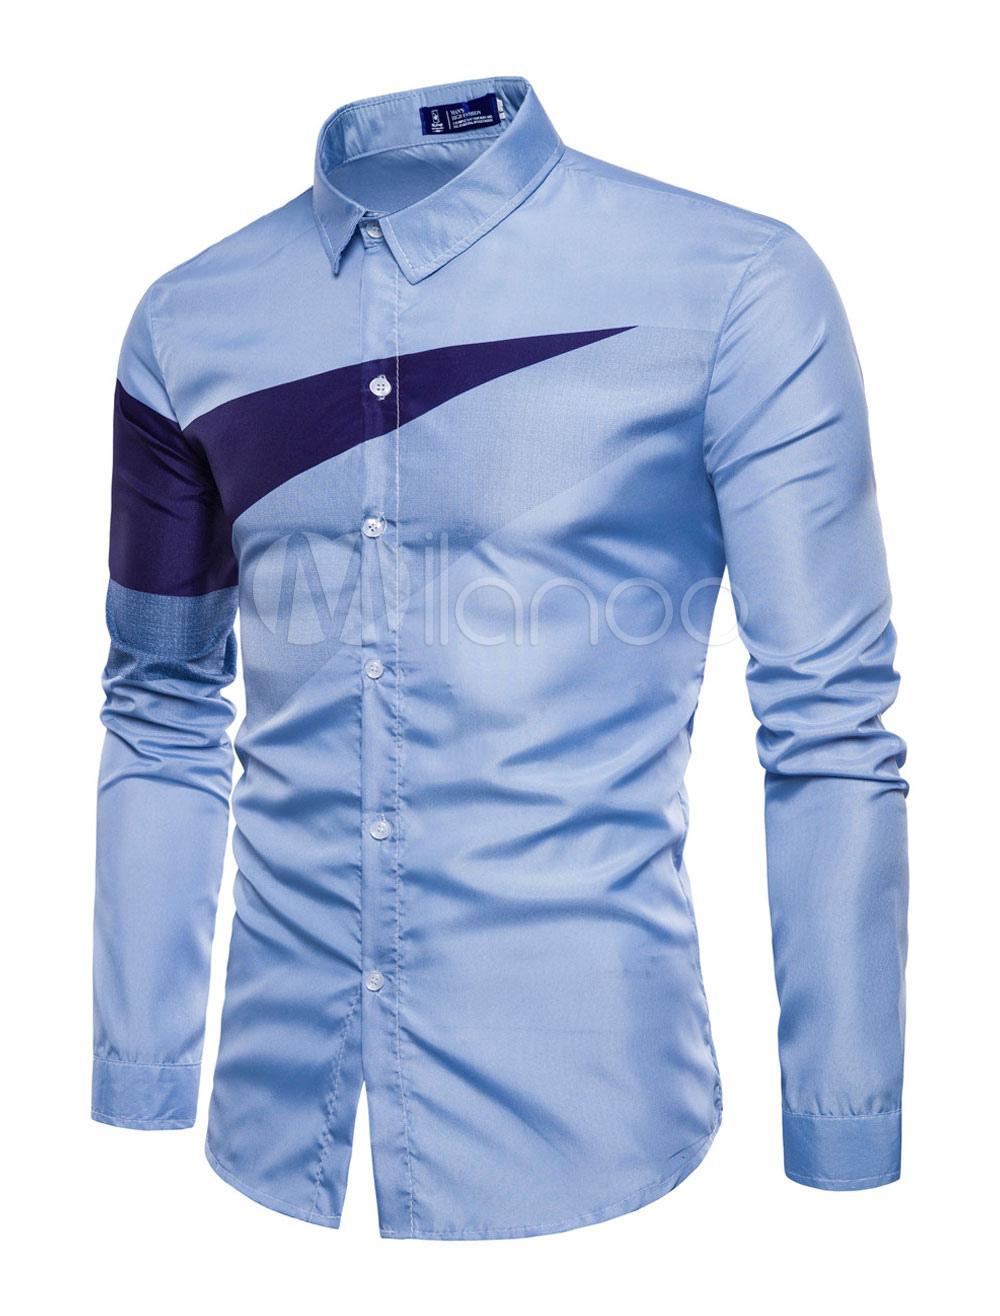 Men Shirt Casual Geometric Print Two Tone Light Blue Long Sleeve Shirt